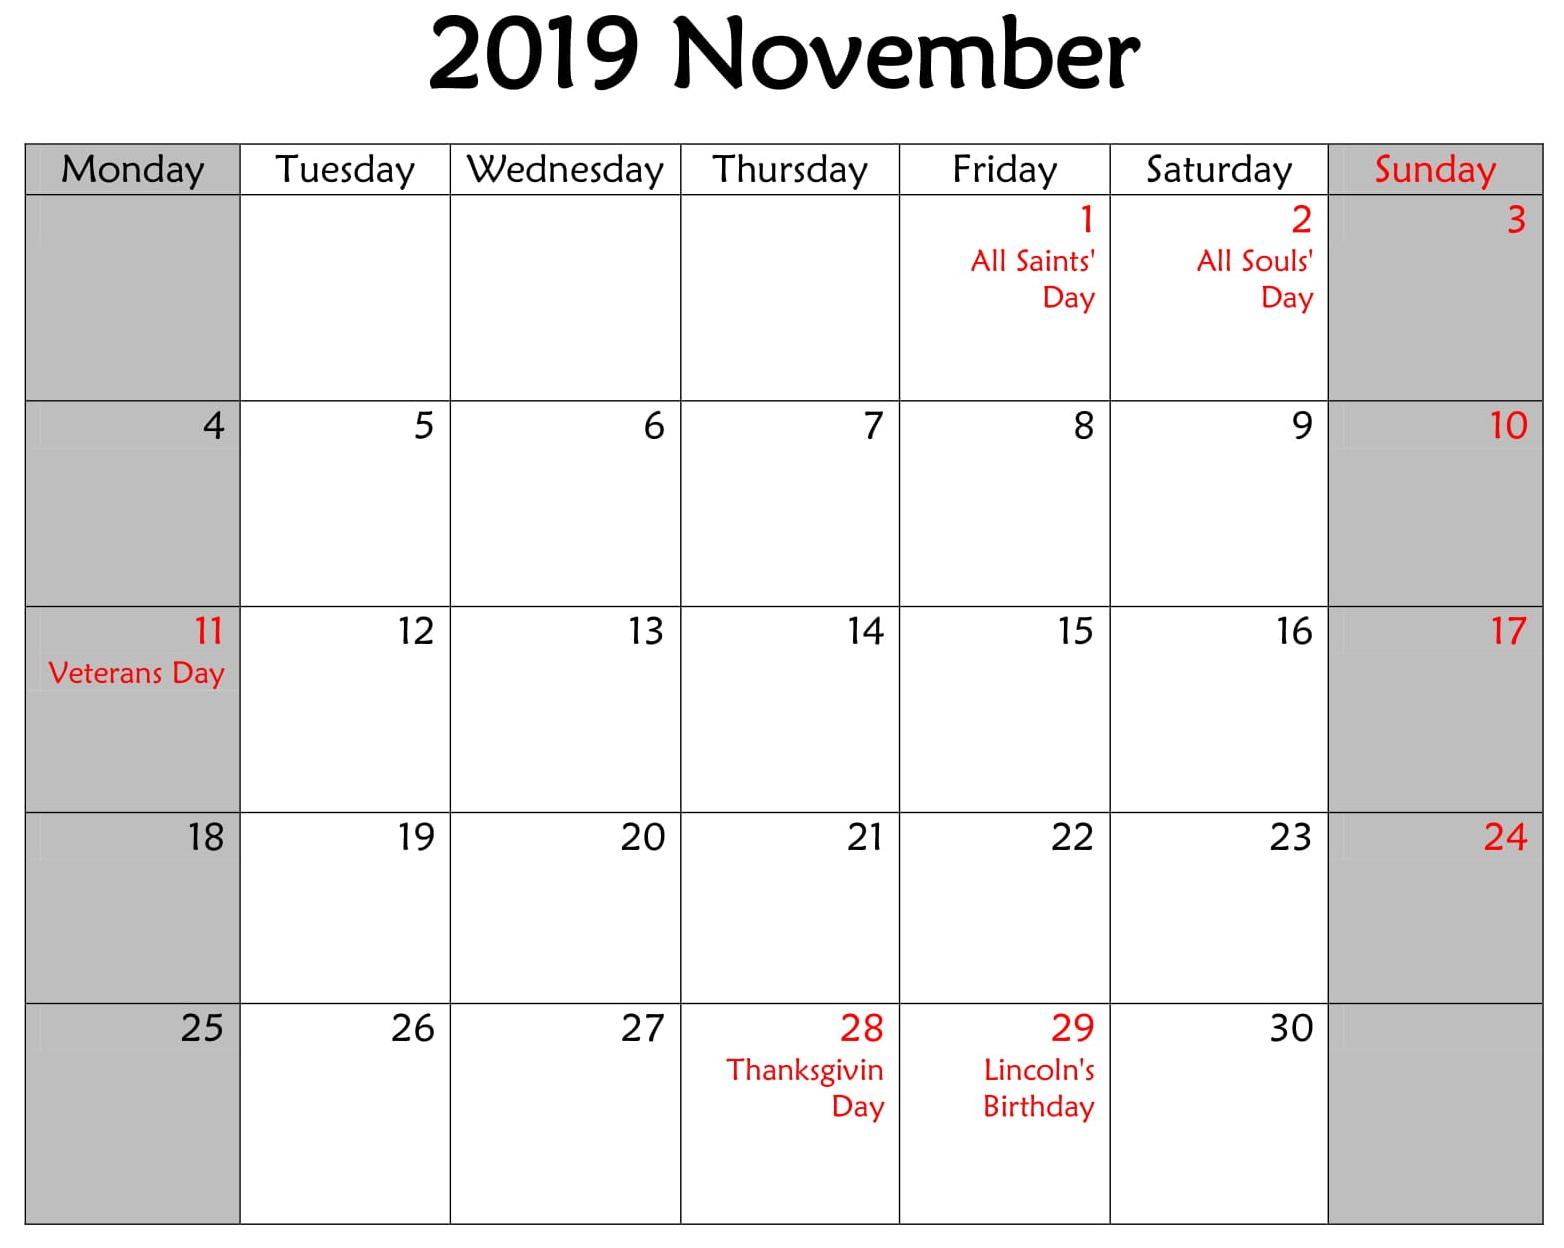 November Booklet 2019 Calendar With Holidays Holiday Calendar Printable Calendar 2019 With Holidays Printable Calendar